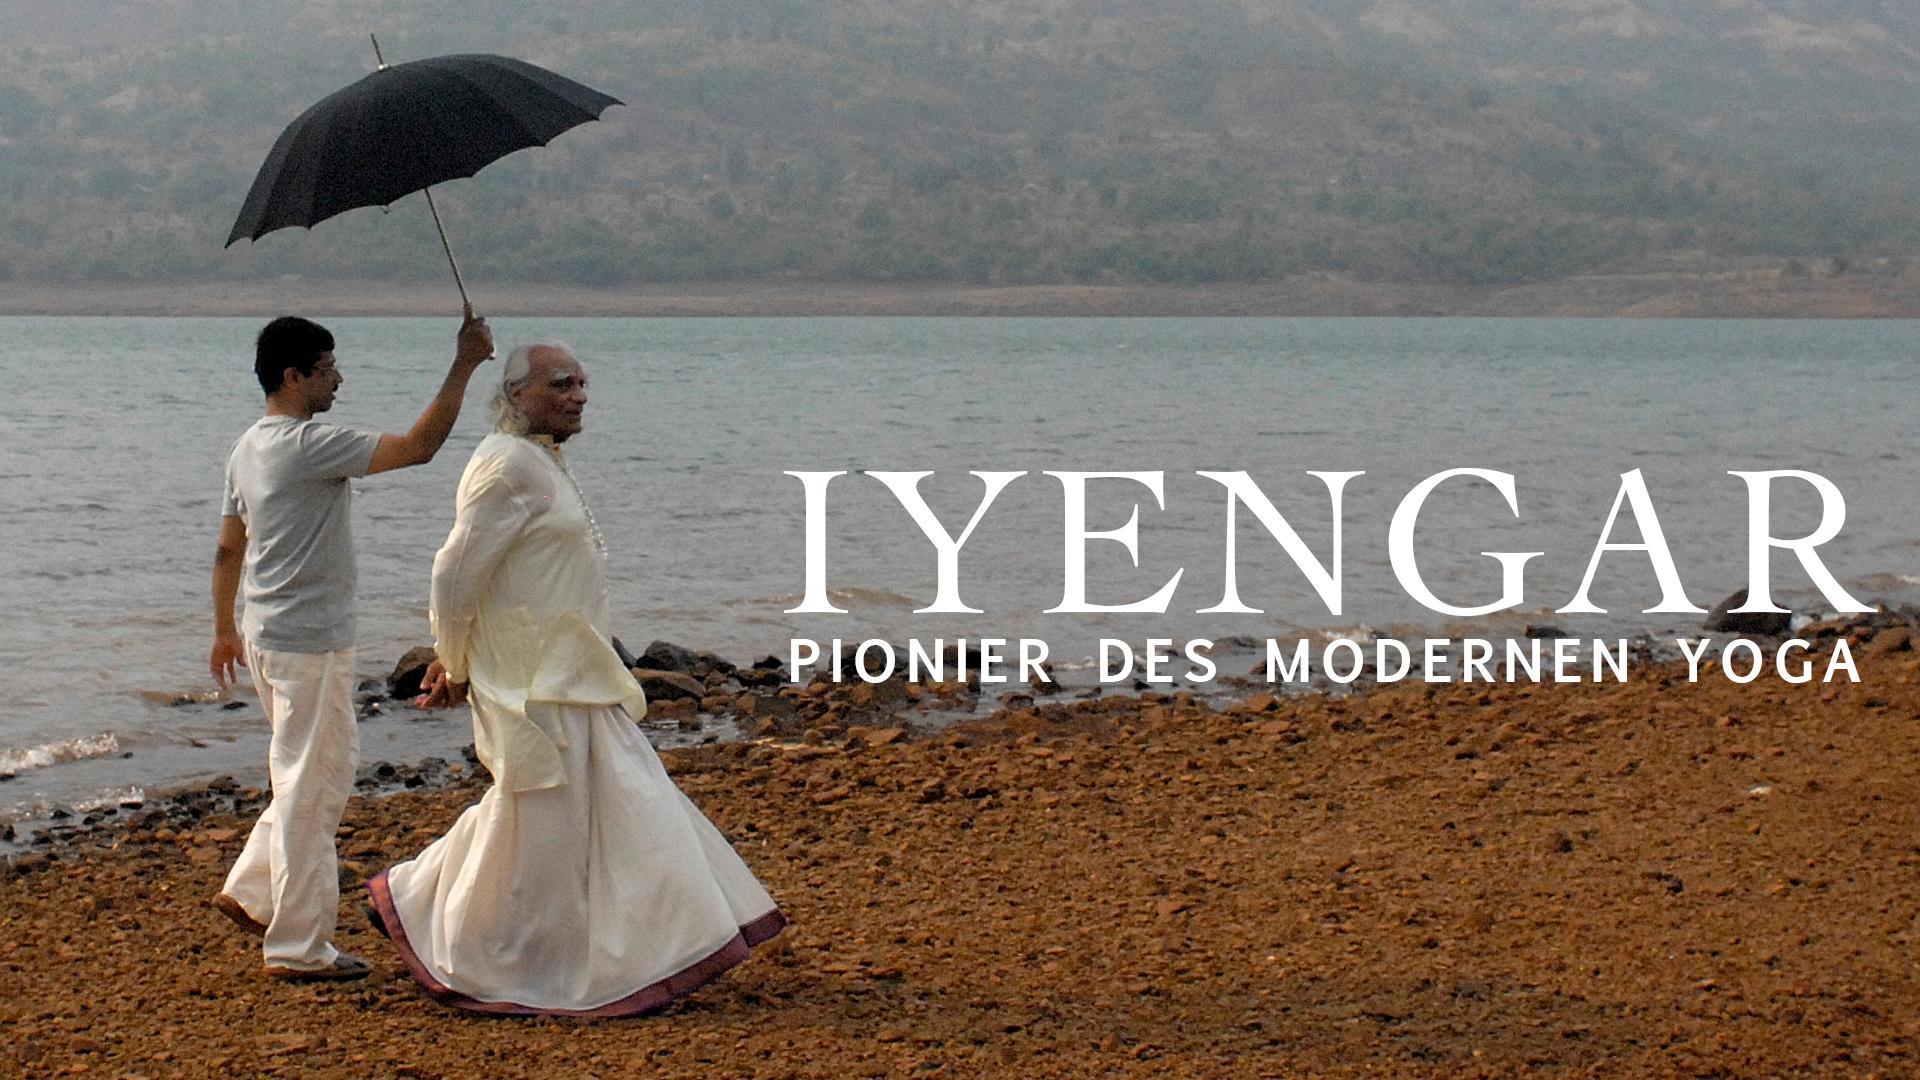 Iyengar - Pionier des modernen Yoga